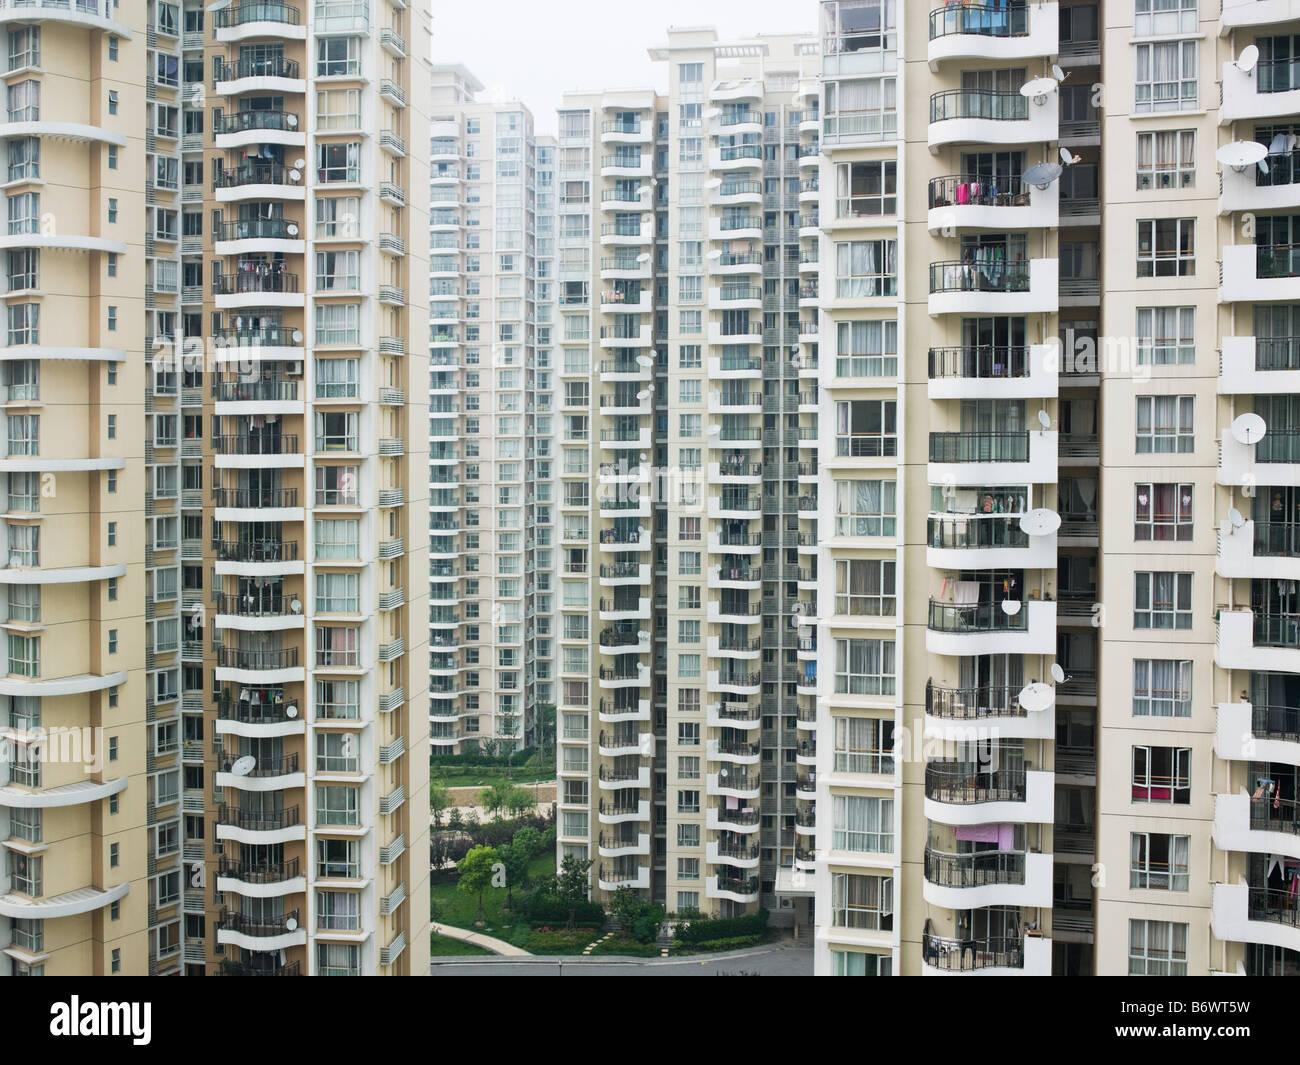 Shanghai apartment buildings - Stock Image